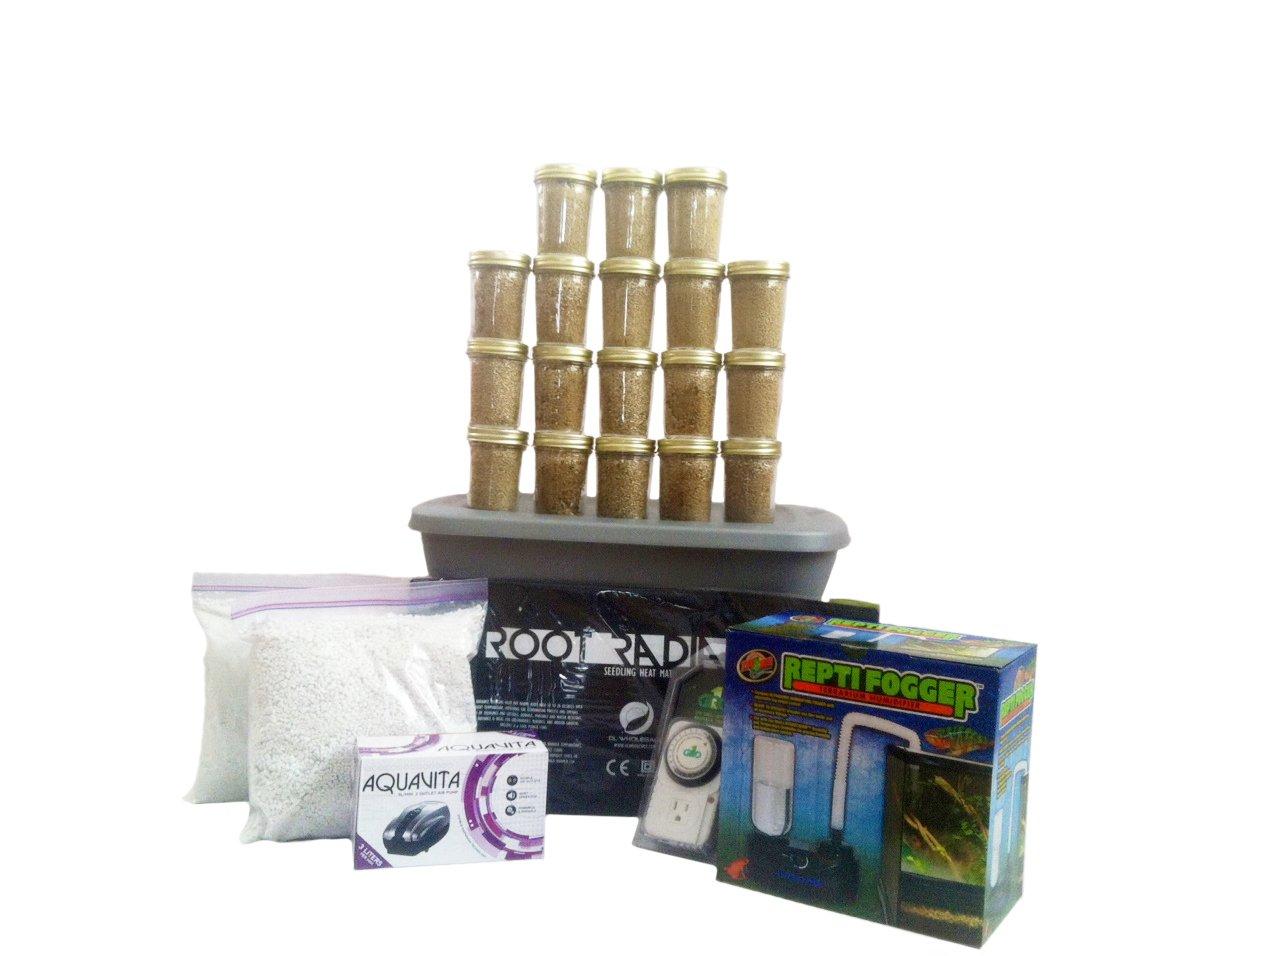 Mega Mushroom Growing and Incubating Kit with Humidifier